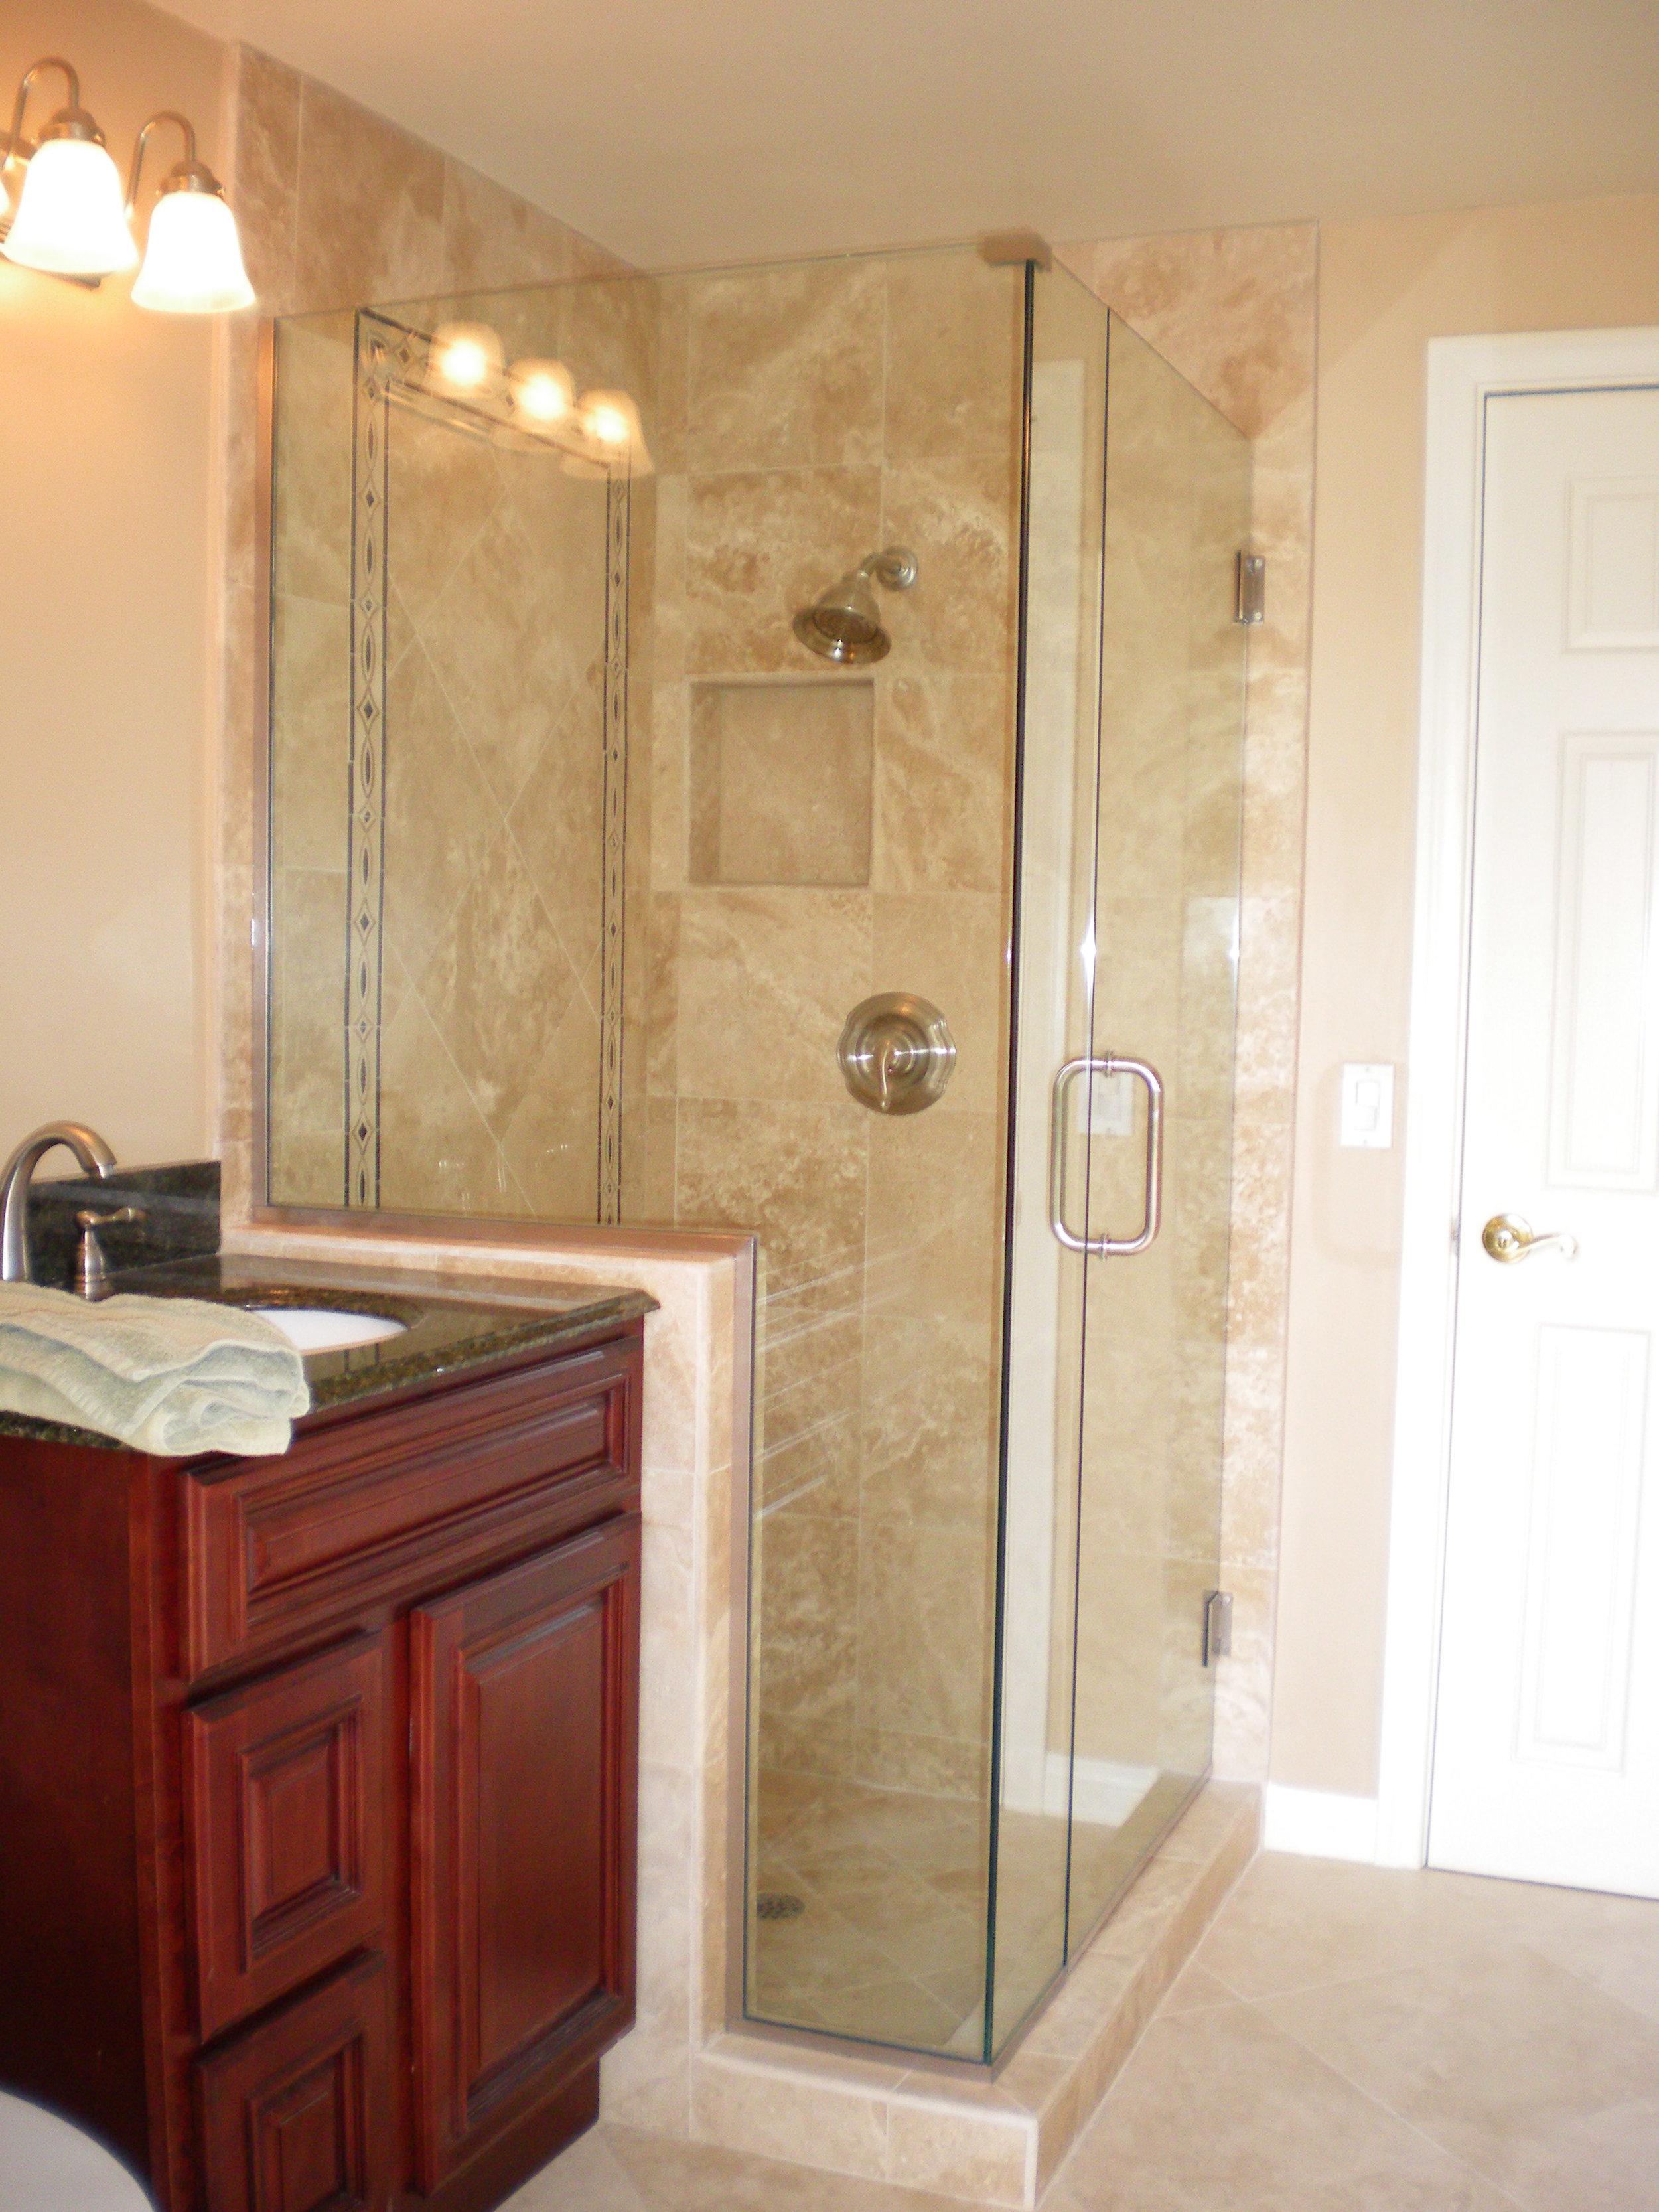 Shower-Doors-Residential-Photos-27.jpg